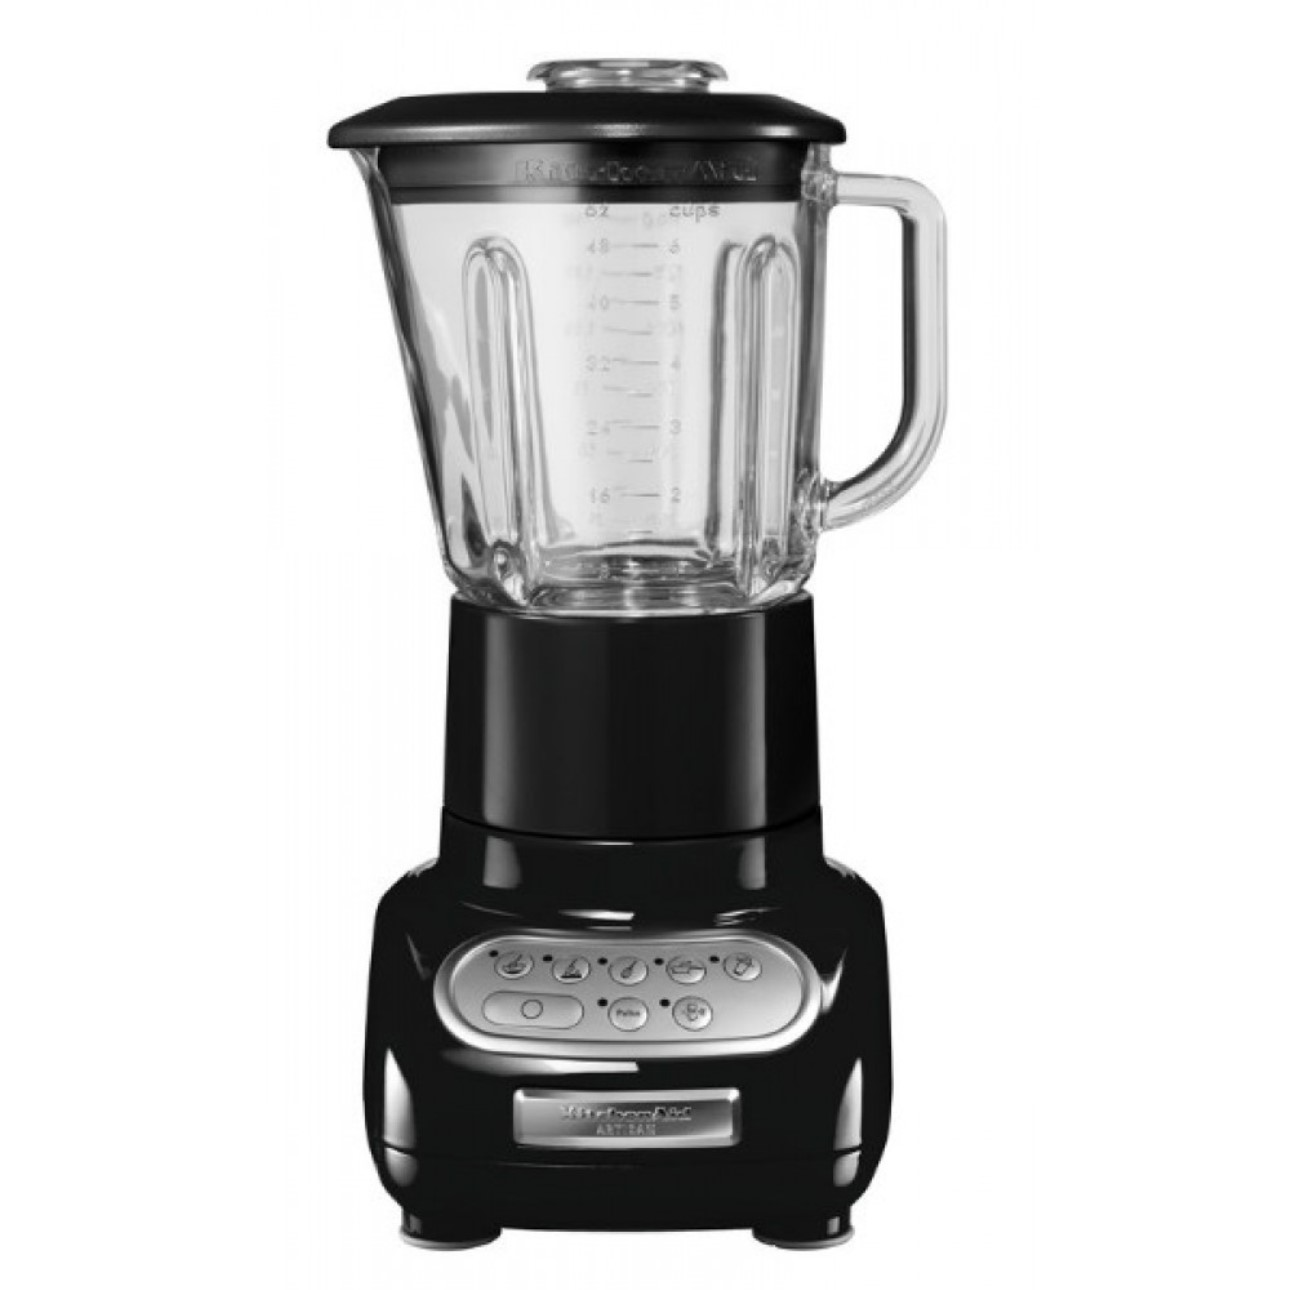 Онлайн каталог PROMENU: Блендер стационарный с кулинарным стаканом KitchenAid Artisan, объем чаши 1,5 л, черный                                                  KitchenAid 5KSB5553EOB